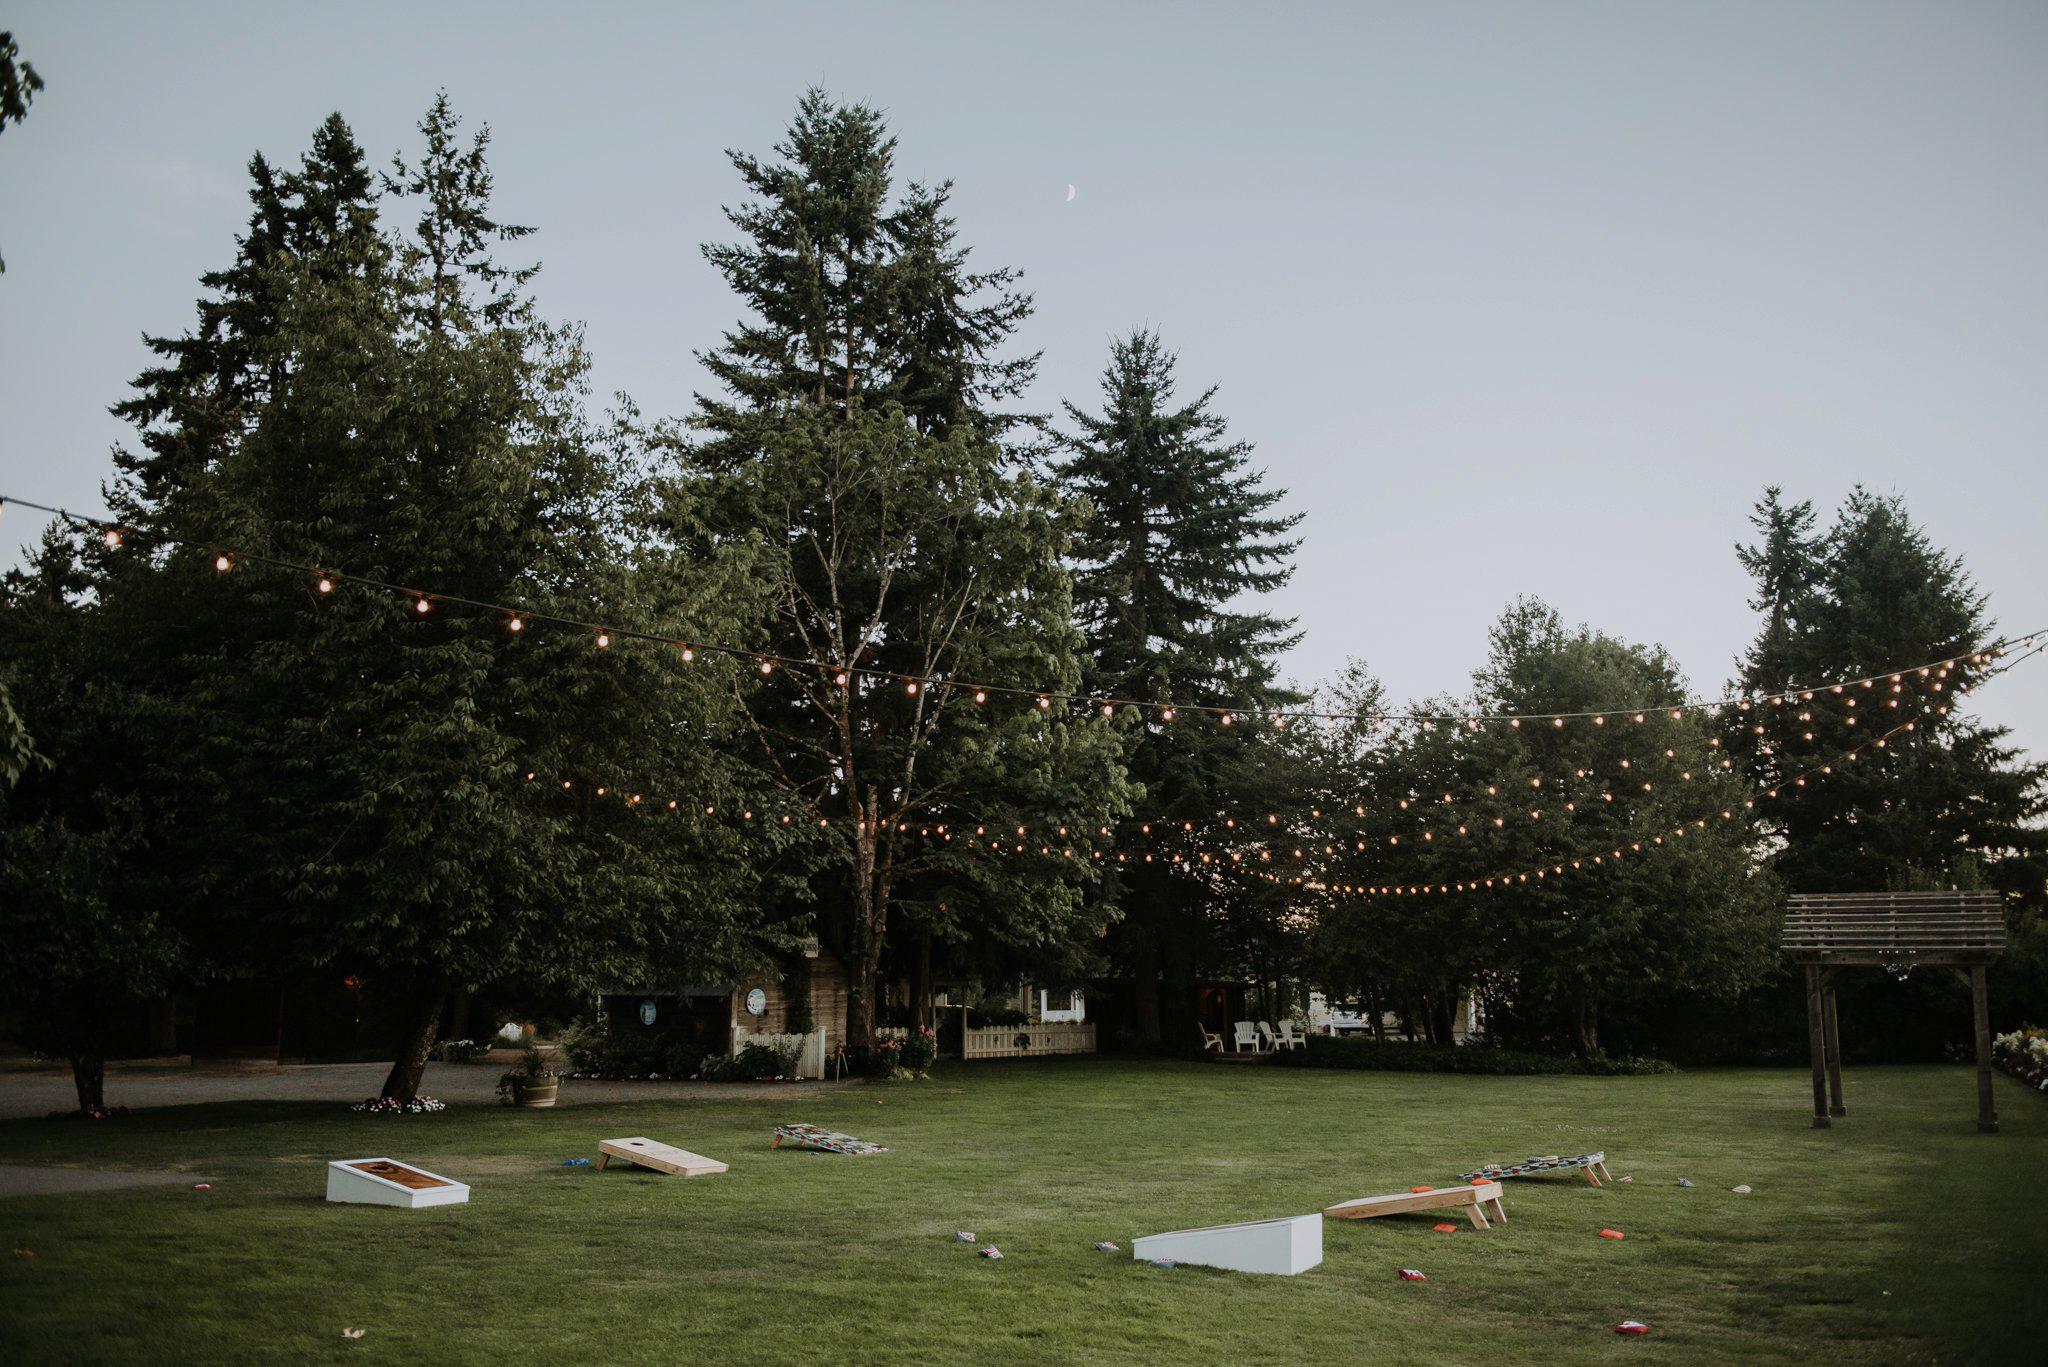 kristen-and-cody-the-kelley-farm-wedding-seattle-photographer-caitlyn-nikula-70.jpg